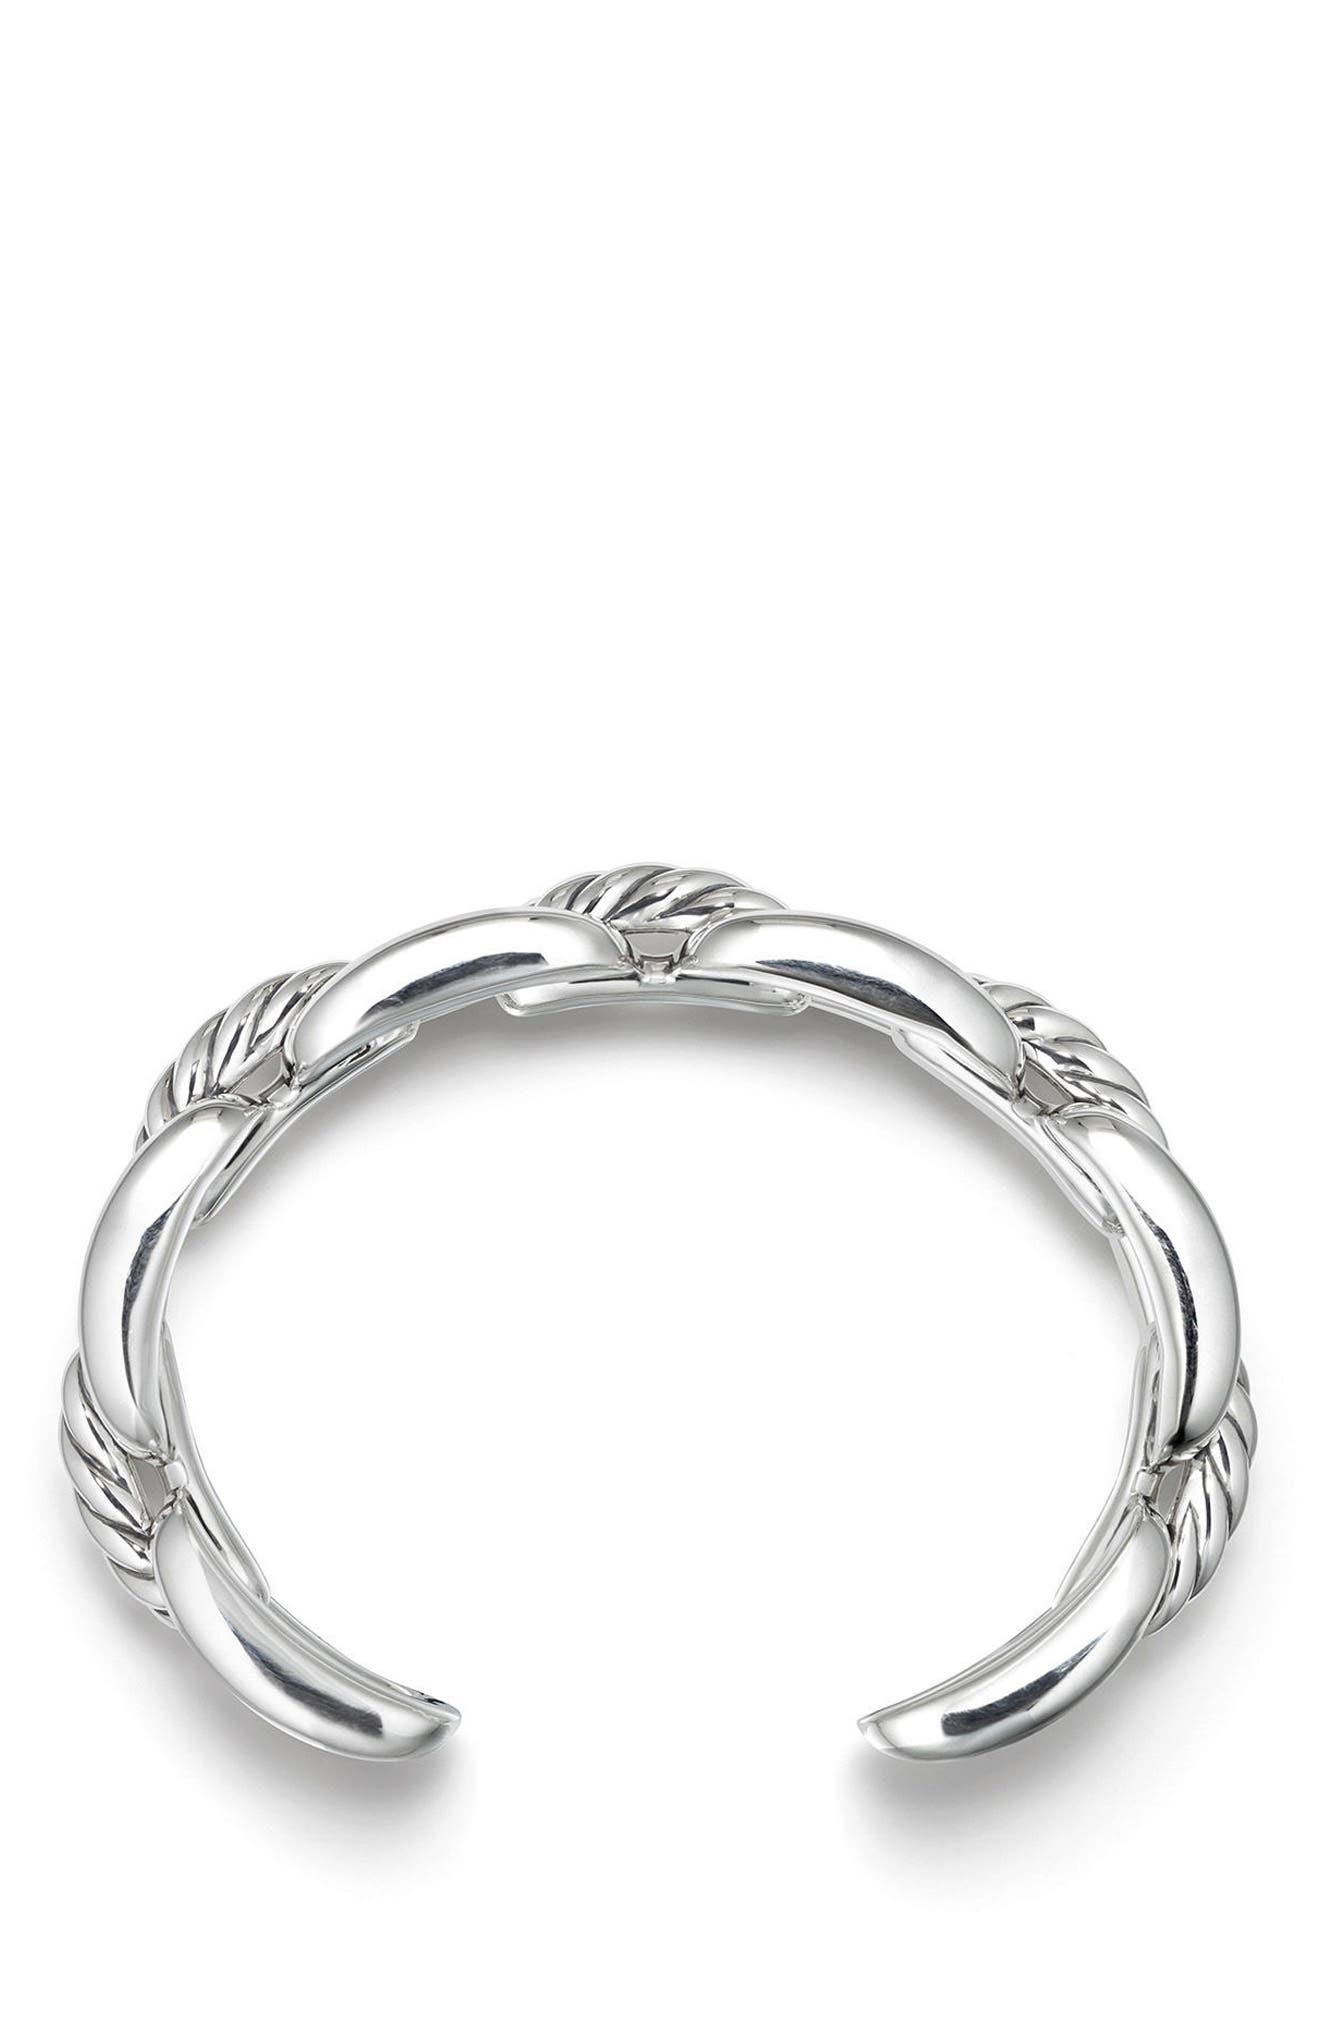 Wellesley Chain Link Cuff Bracelet,                             Alternate thumbnail 2, color,                             SILVER